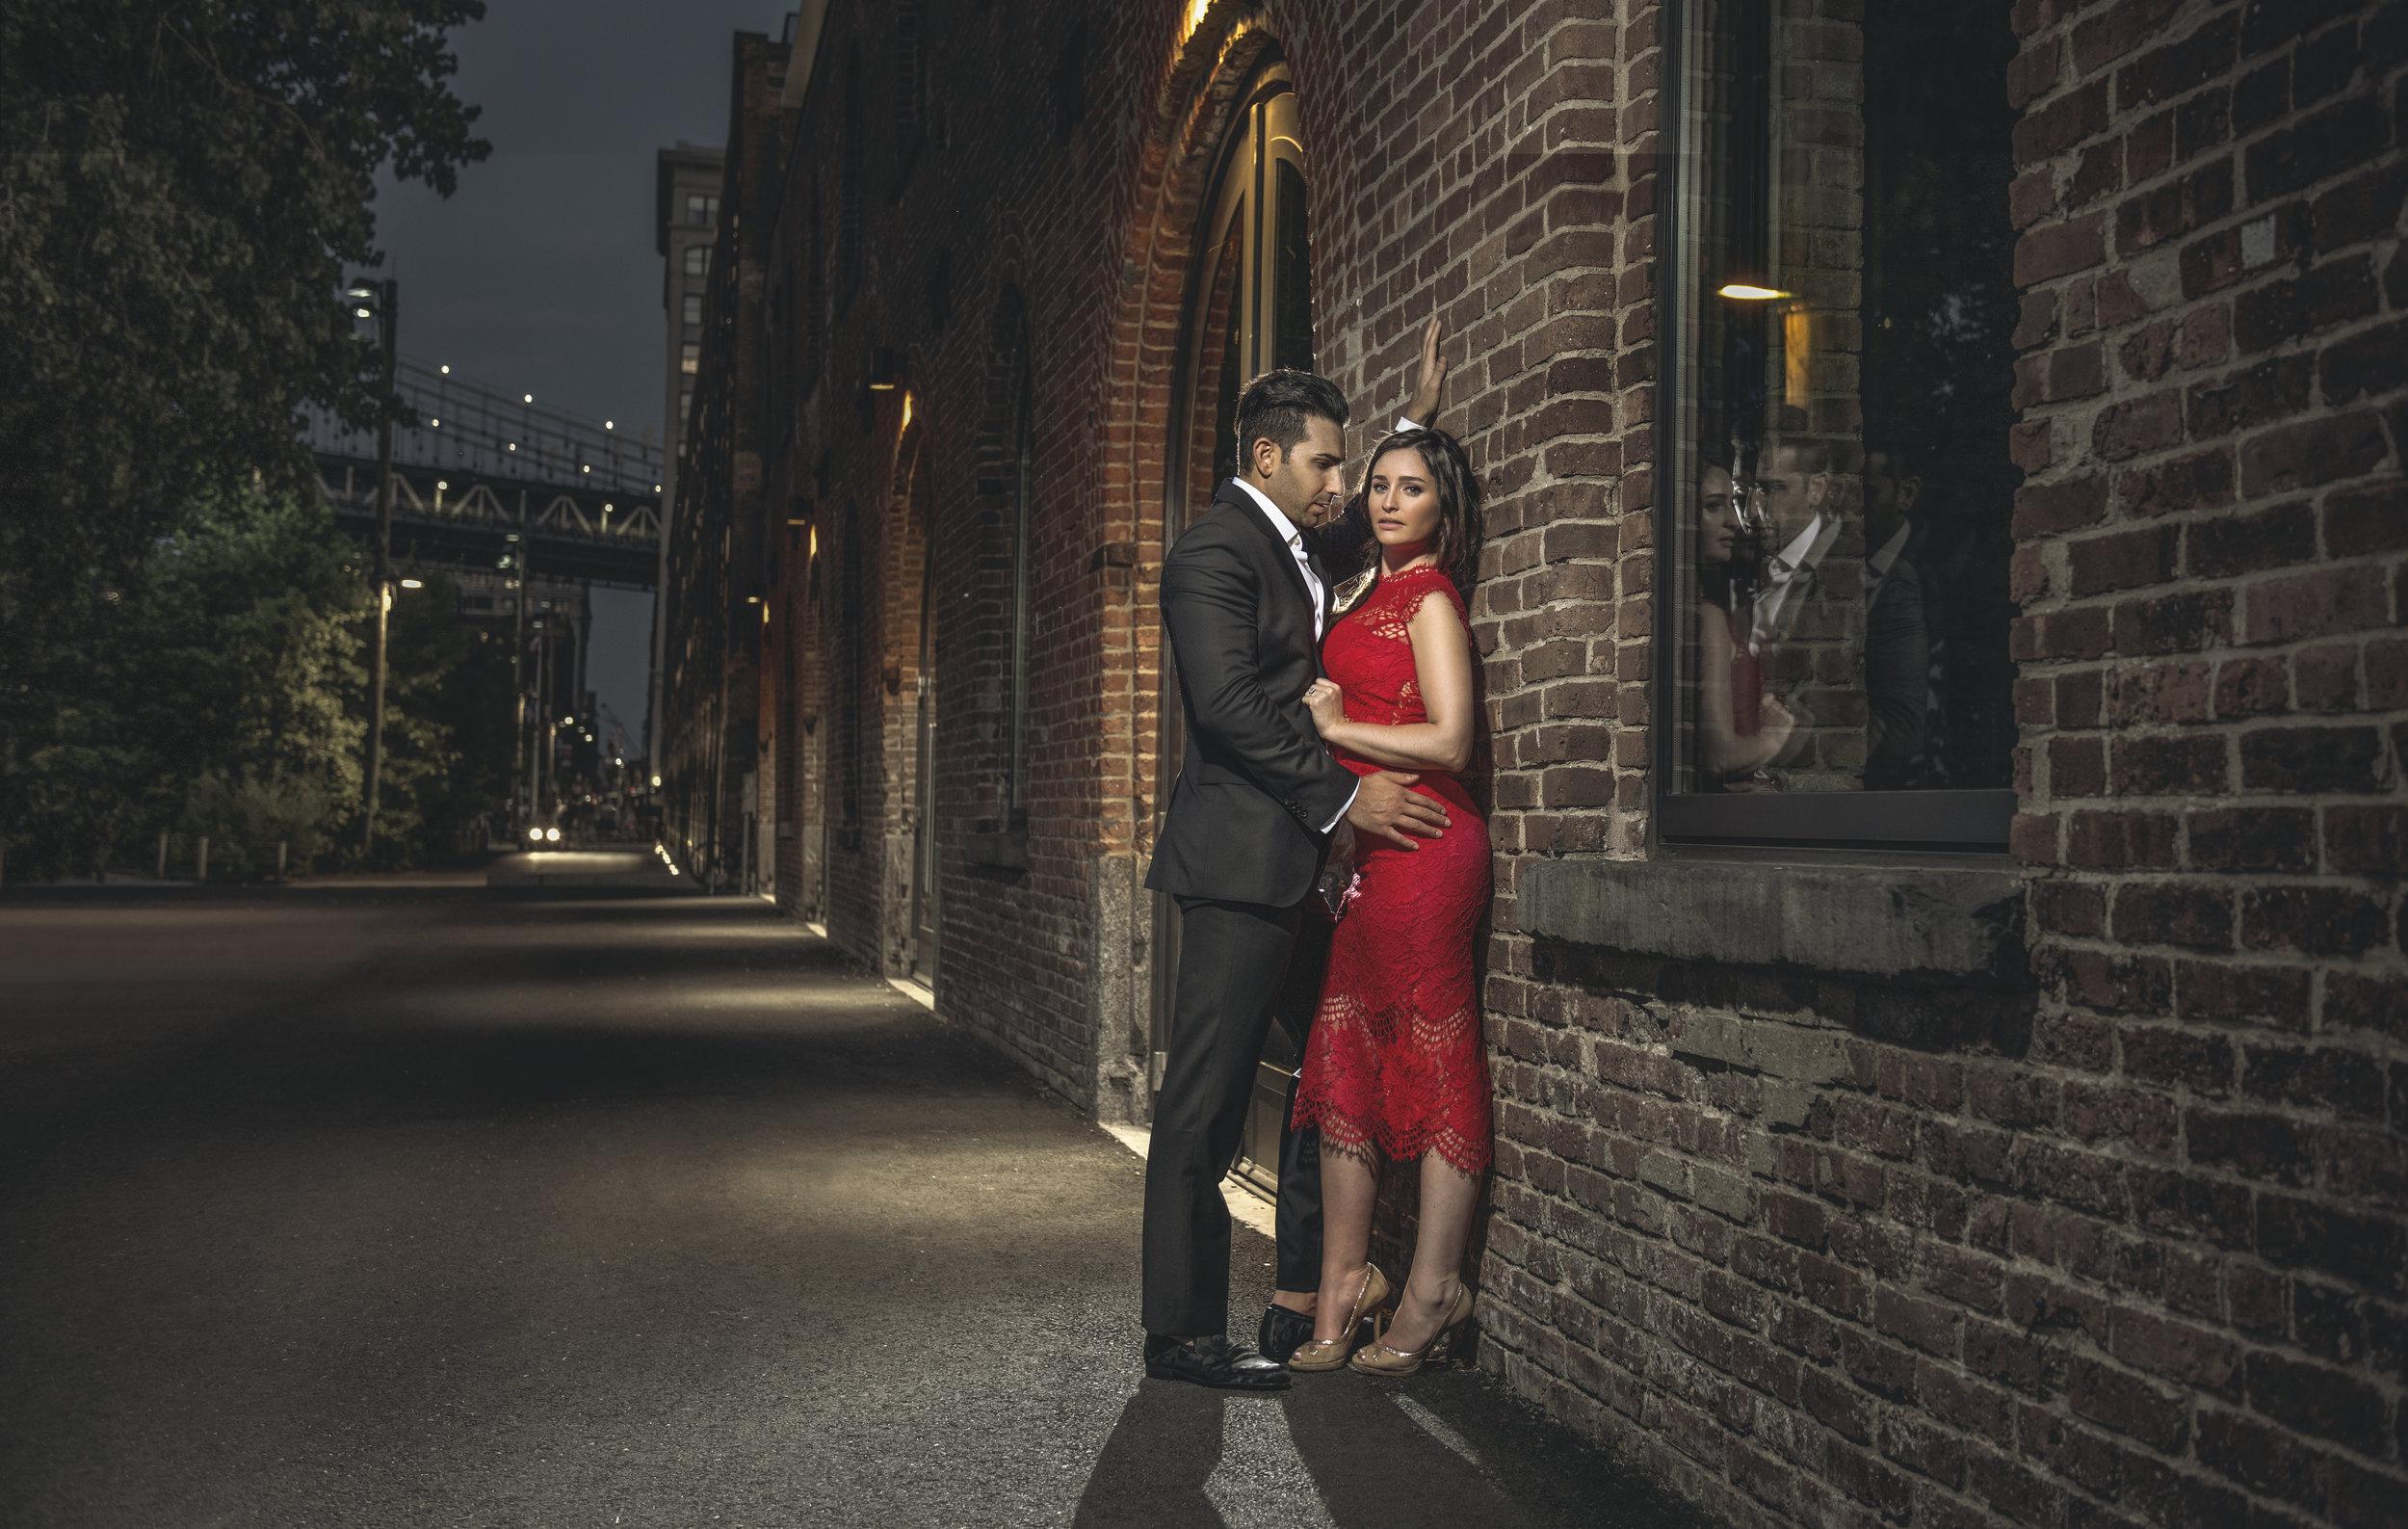 Engagement A 53.jpg